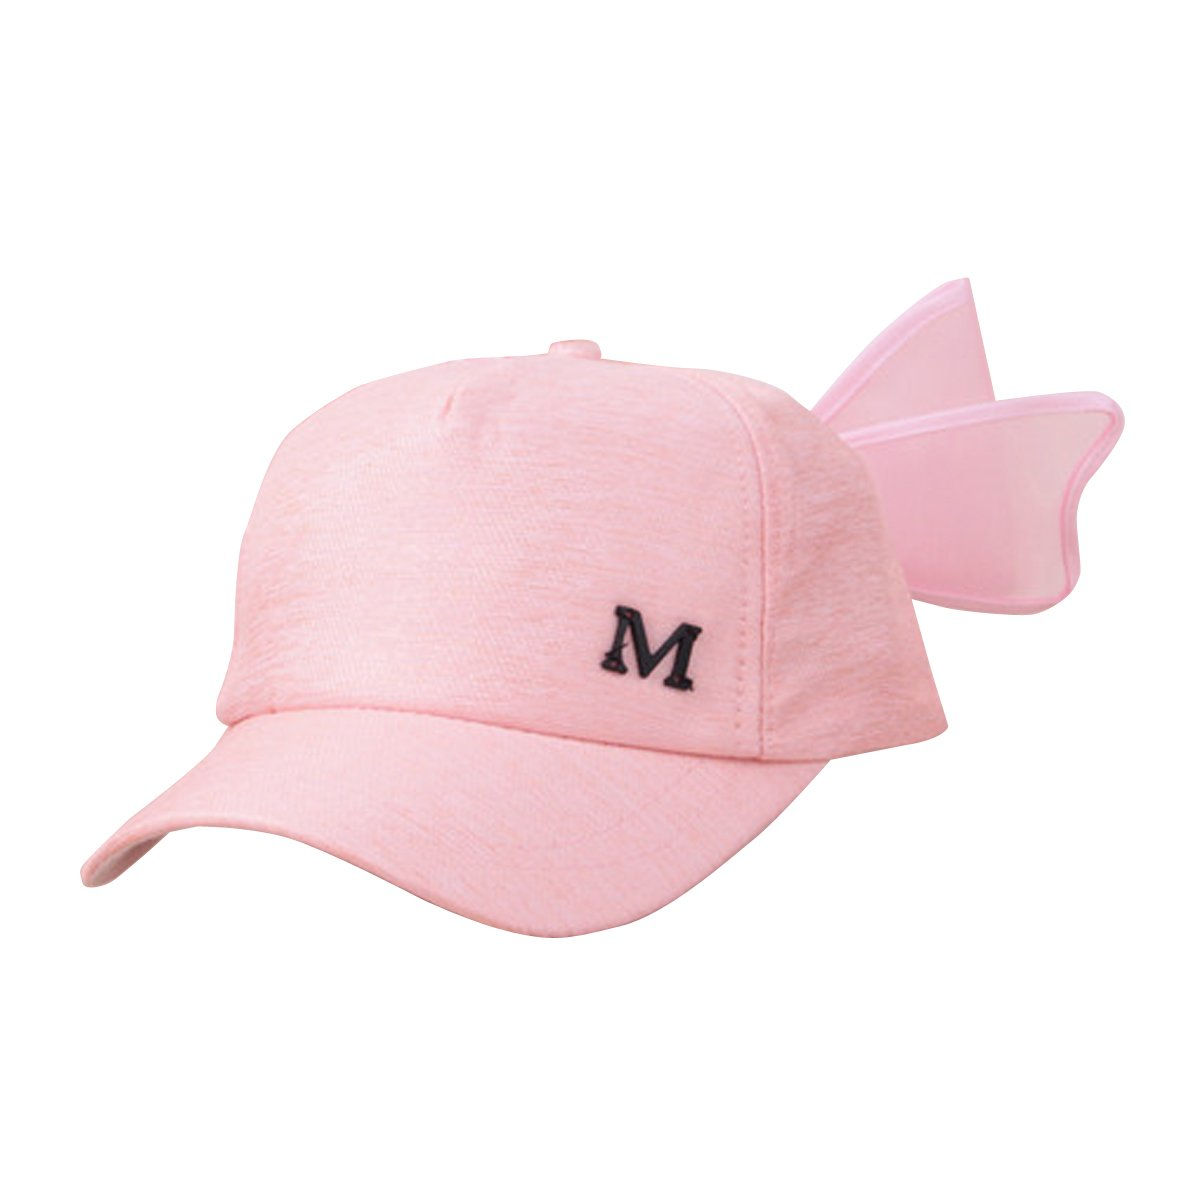 85a9adbb26439 Amazon.com   SEADEAR Lovely Bowknot Children s Baseball Cap Summer Baby  Shade Cap Beach Sun Visor Hat for Kids girls(Black)   Sports   Outdoors